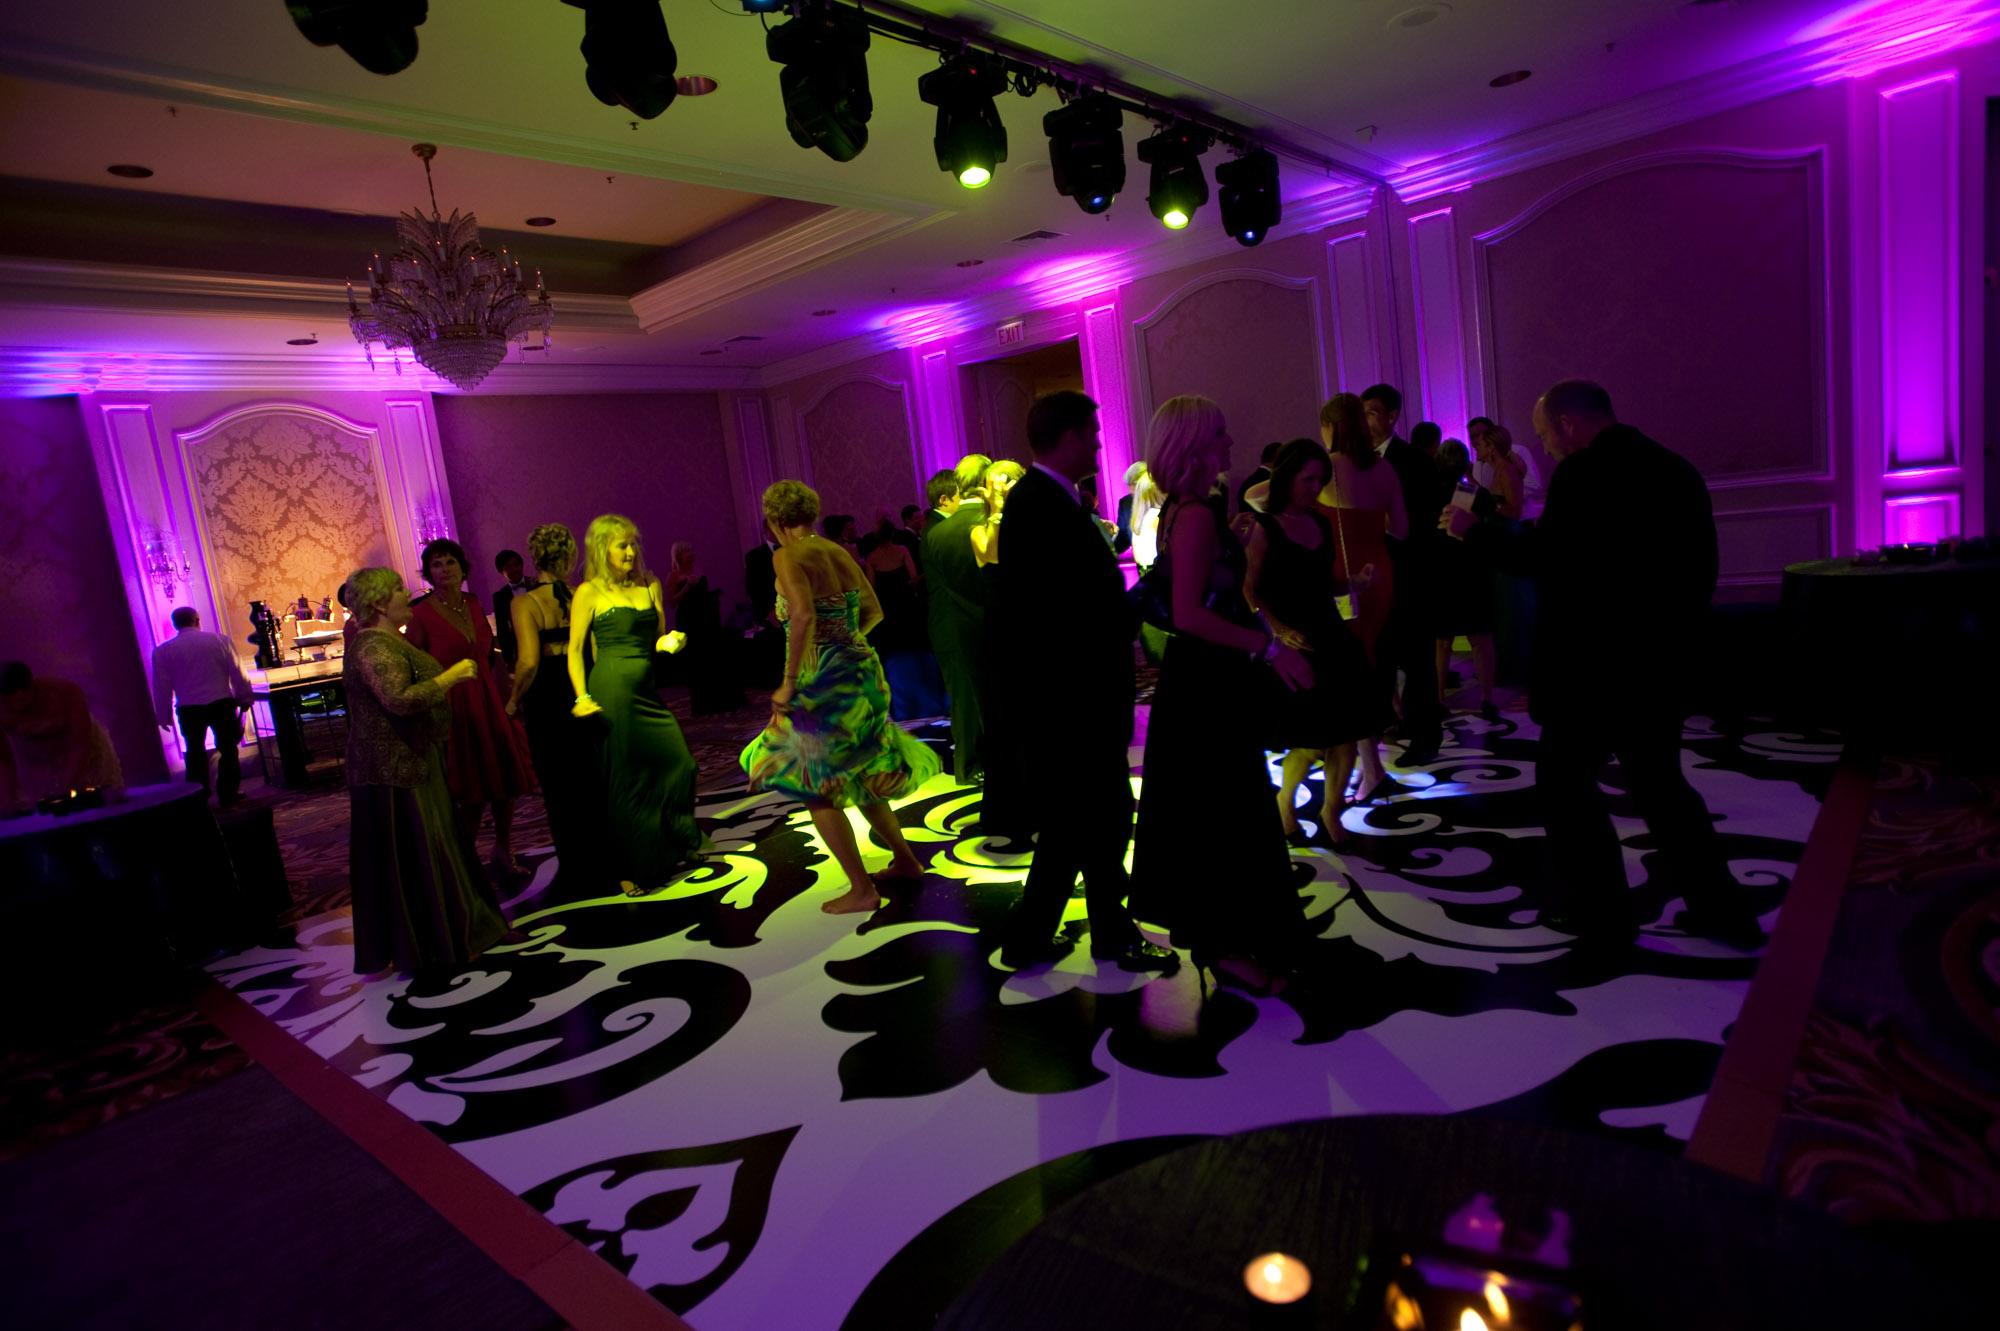 birch-bespoke-events-and-weddings-35.jpg